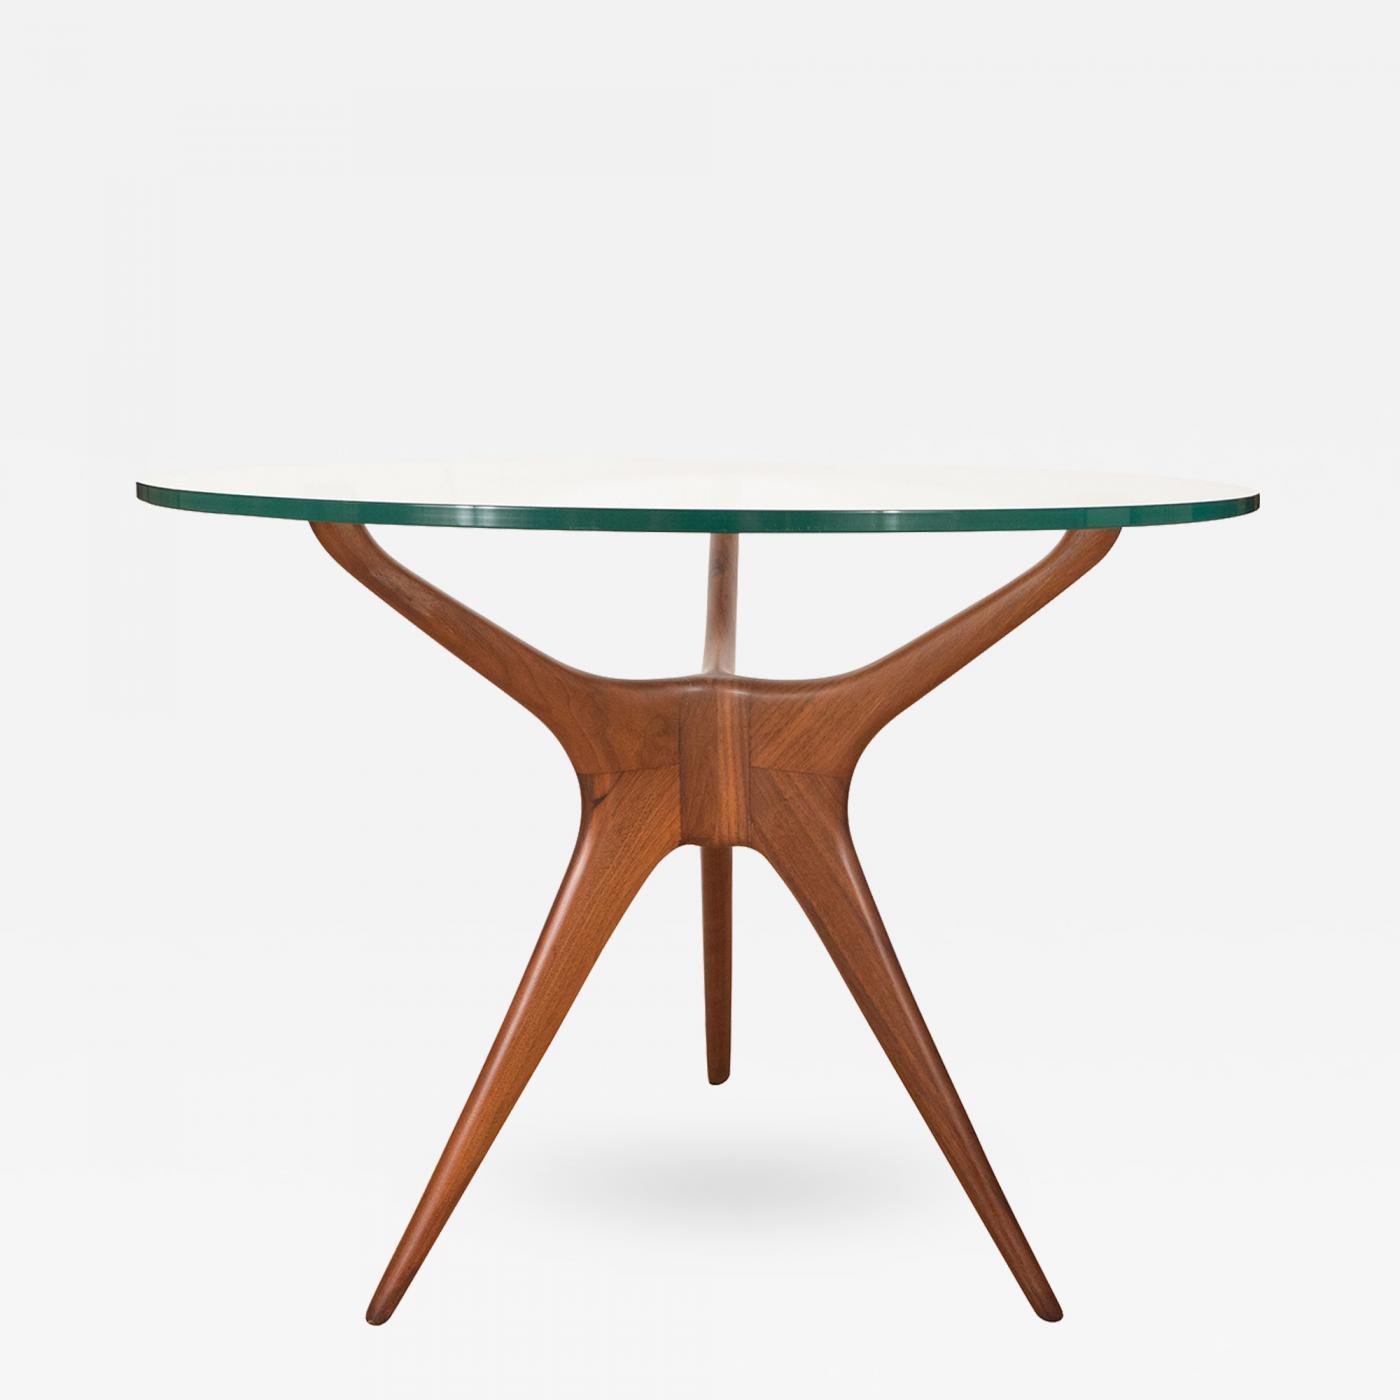 Kagan Coffee Table.Vladimir Kagan Pair Of Sculpted Walnut And Glass Side Tables By Vladimir Kagan